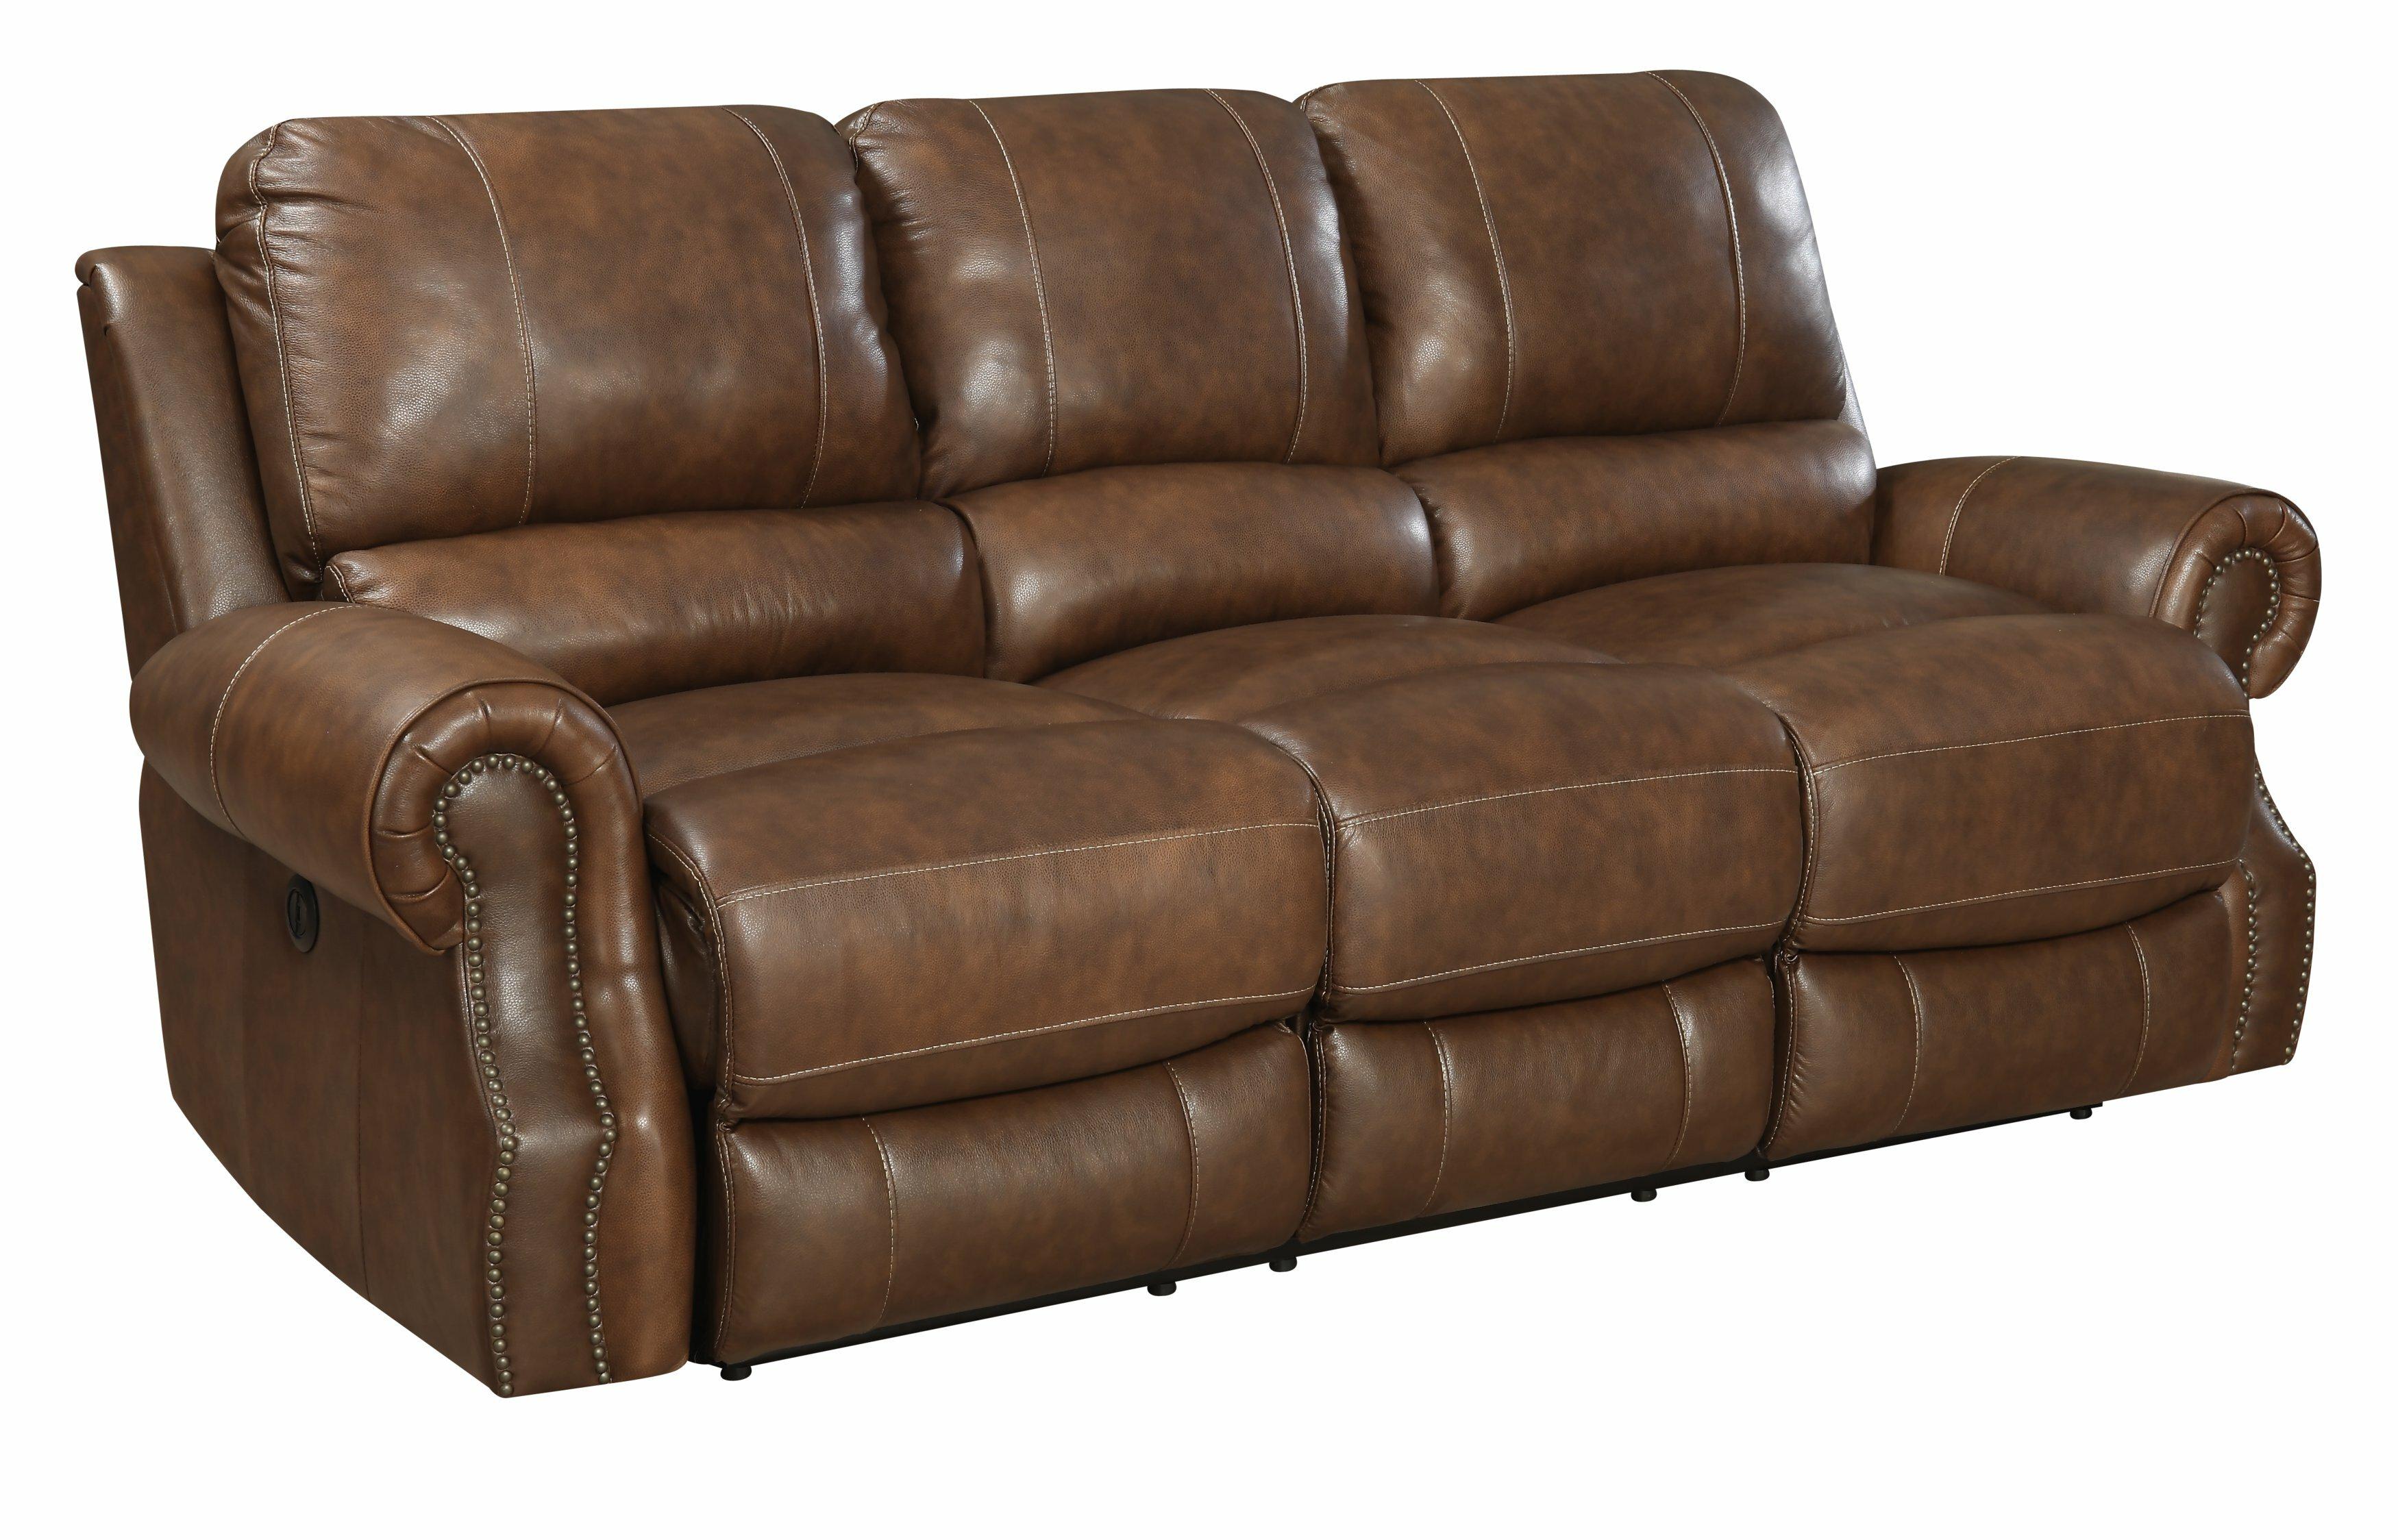 Red barrel studio crete leather reclining sofa reviews wayfair